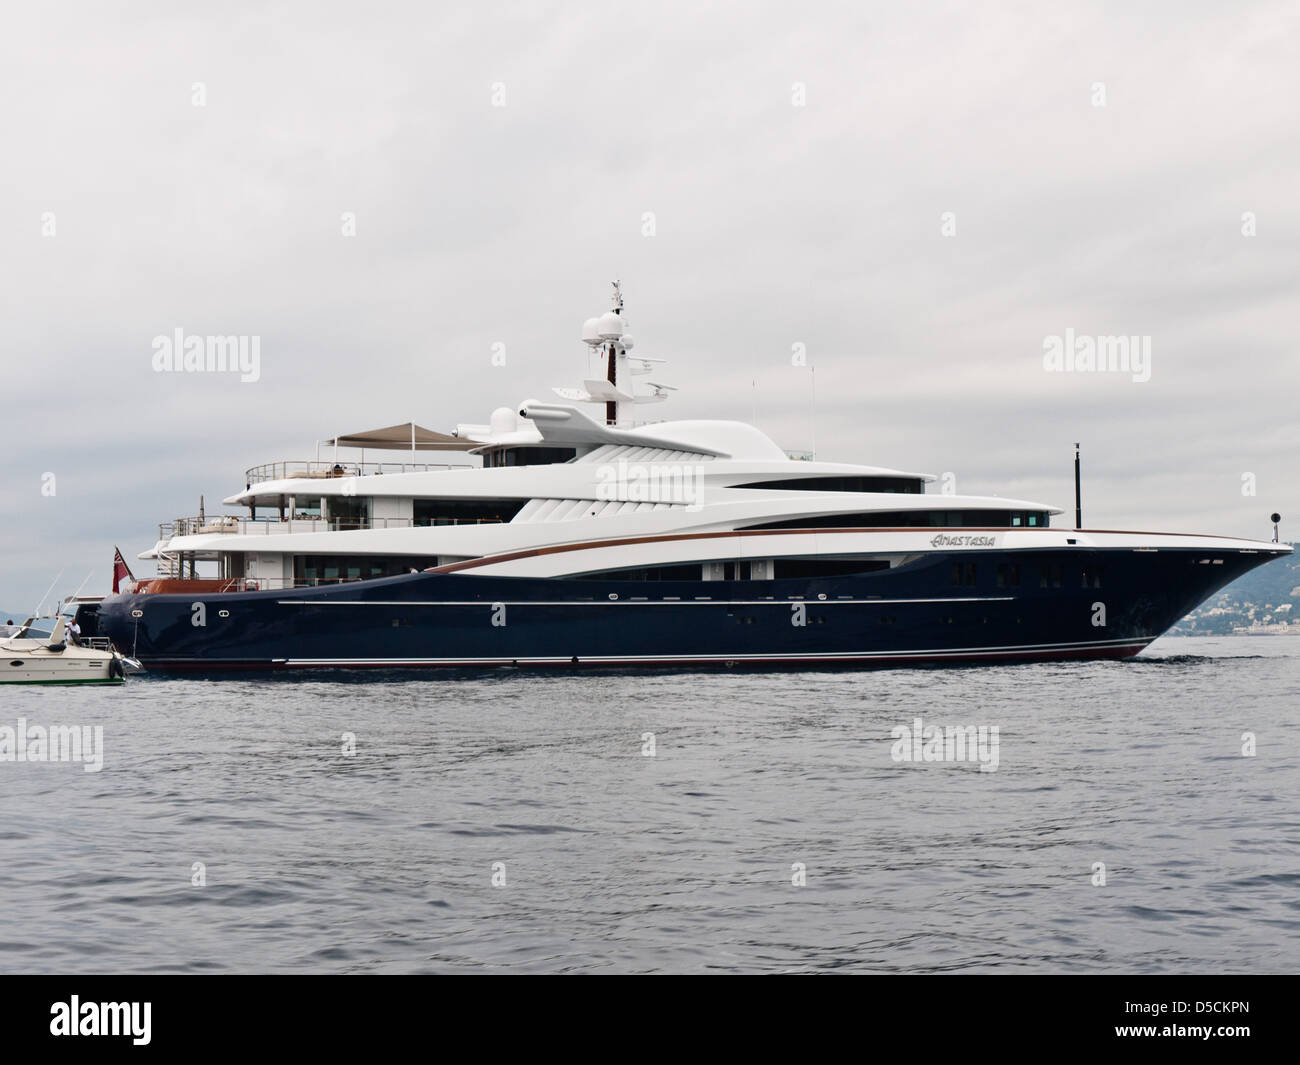 Roman Abramovich yacht Anastasia infront the Hotel du Cap Eden Roc Stock Photo - Alamy